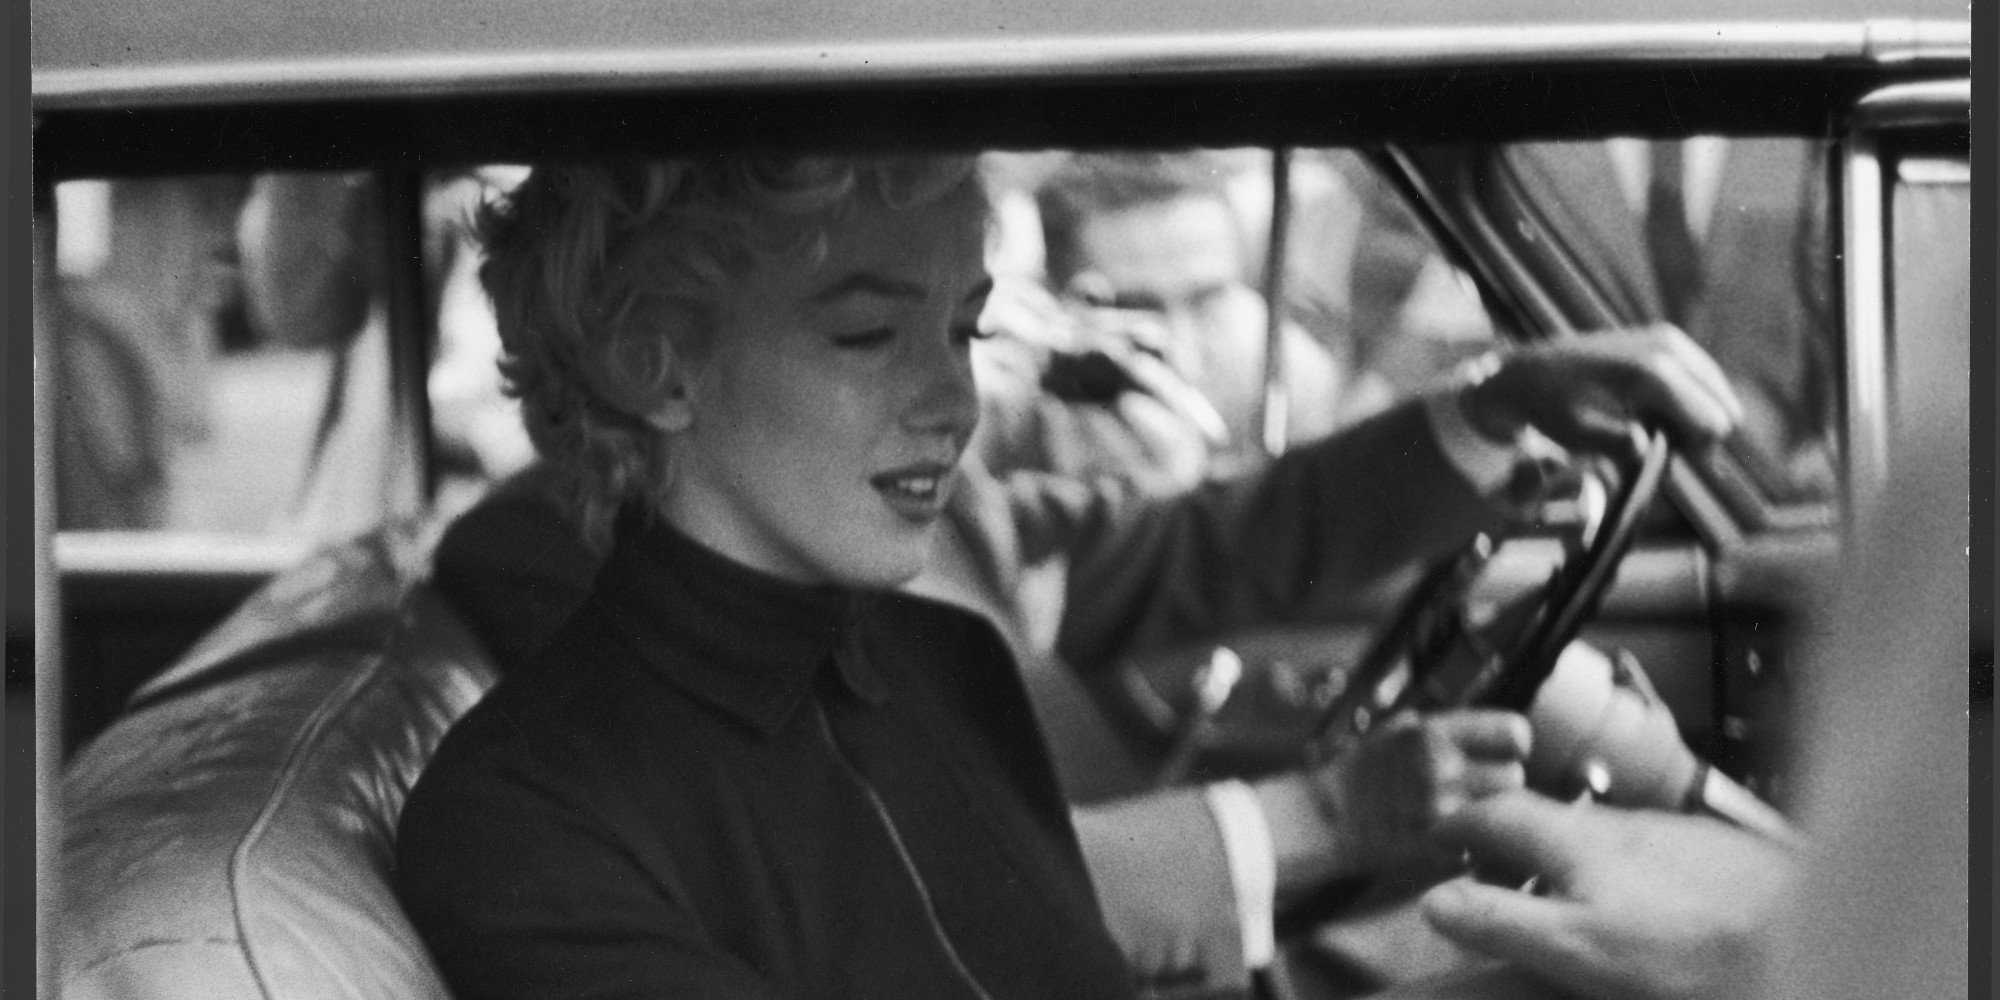 Crime Scene Photos Of Marilyn Monroe O-marilyn-monroe-facebook.jpg